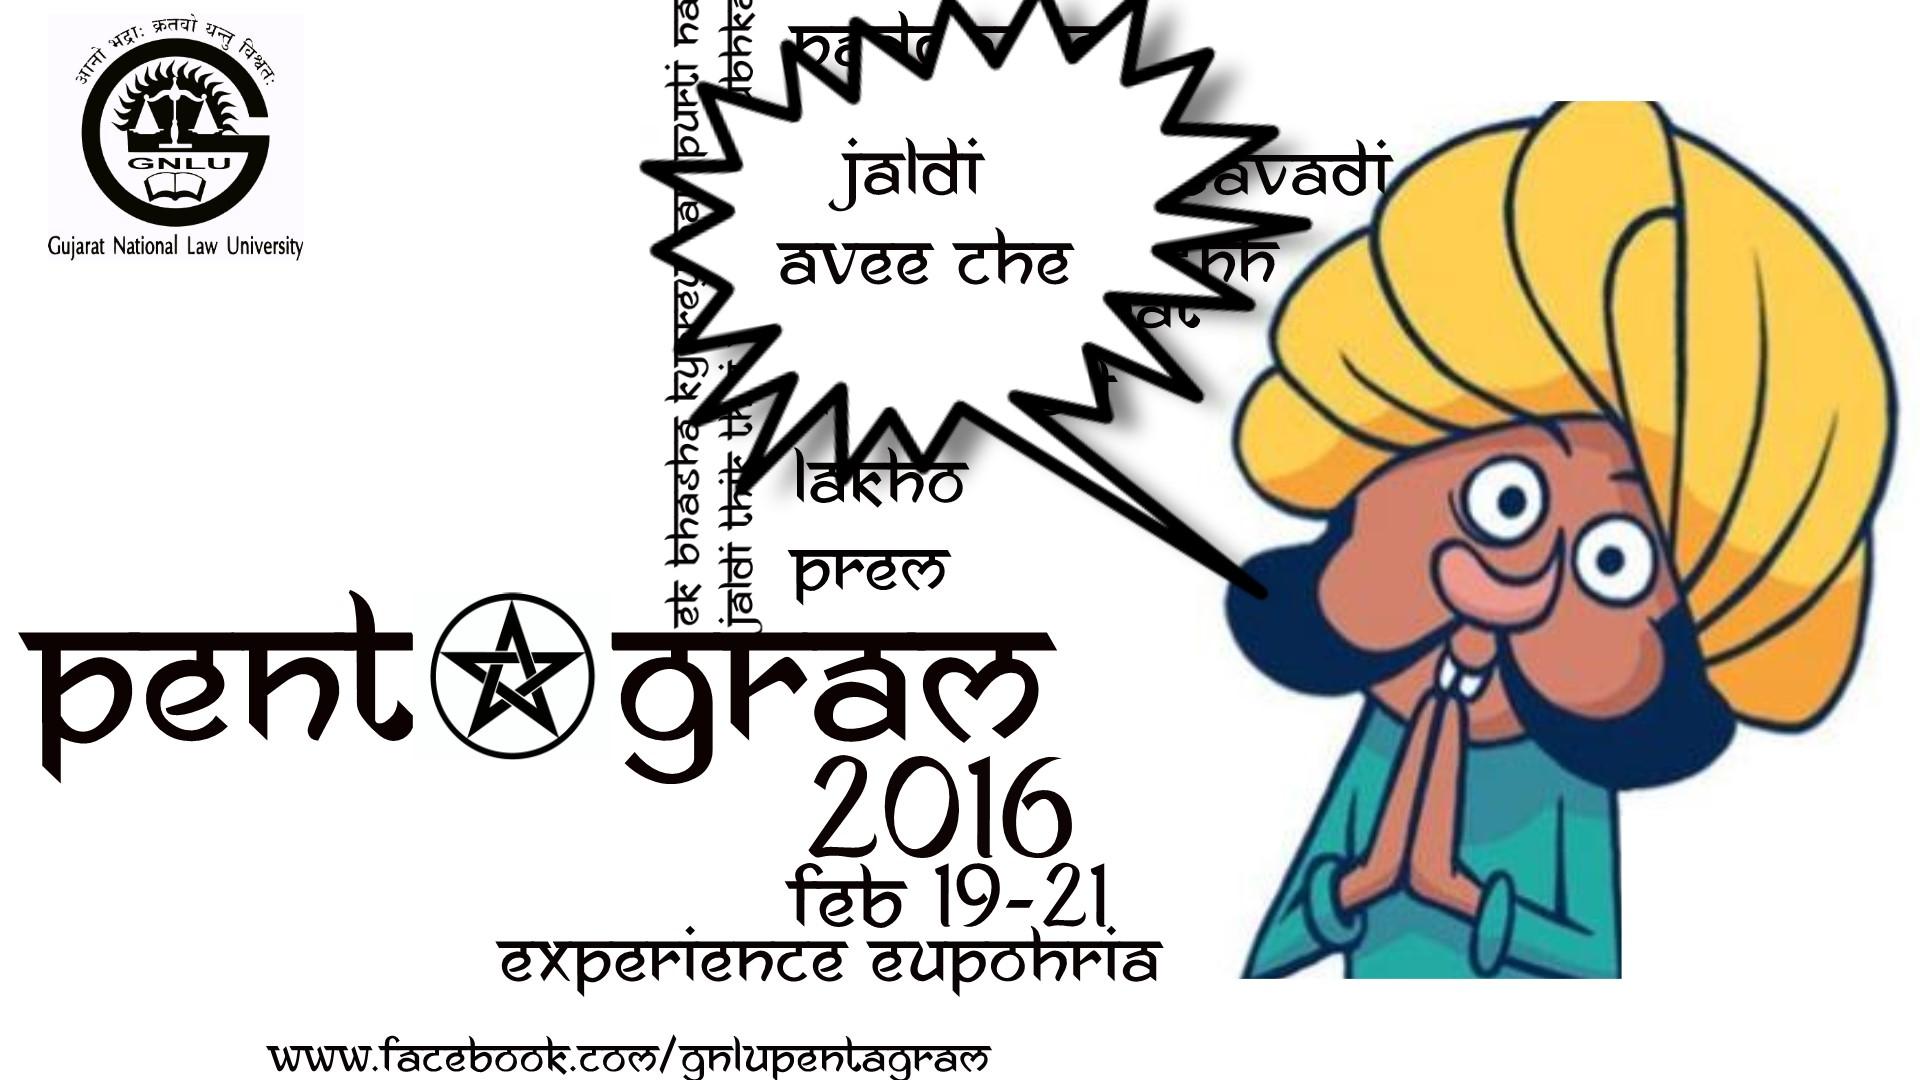 GNLU's Annual Cultural Fest Pentagram 2016